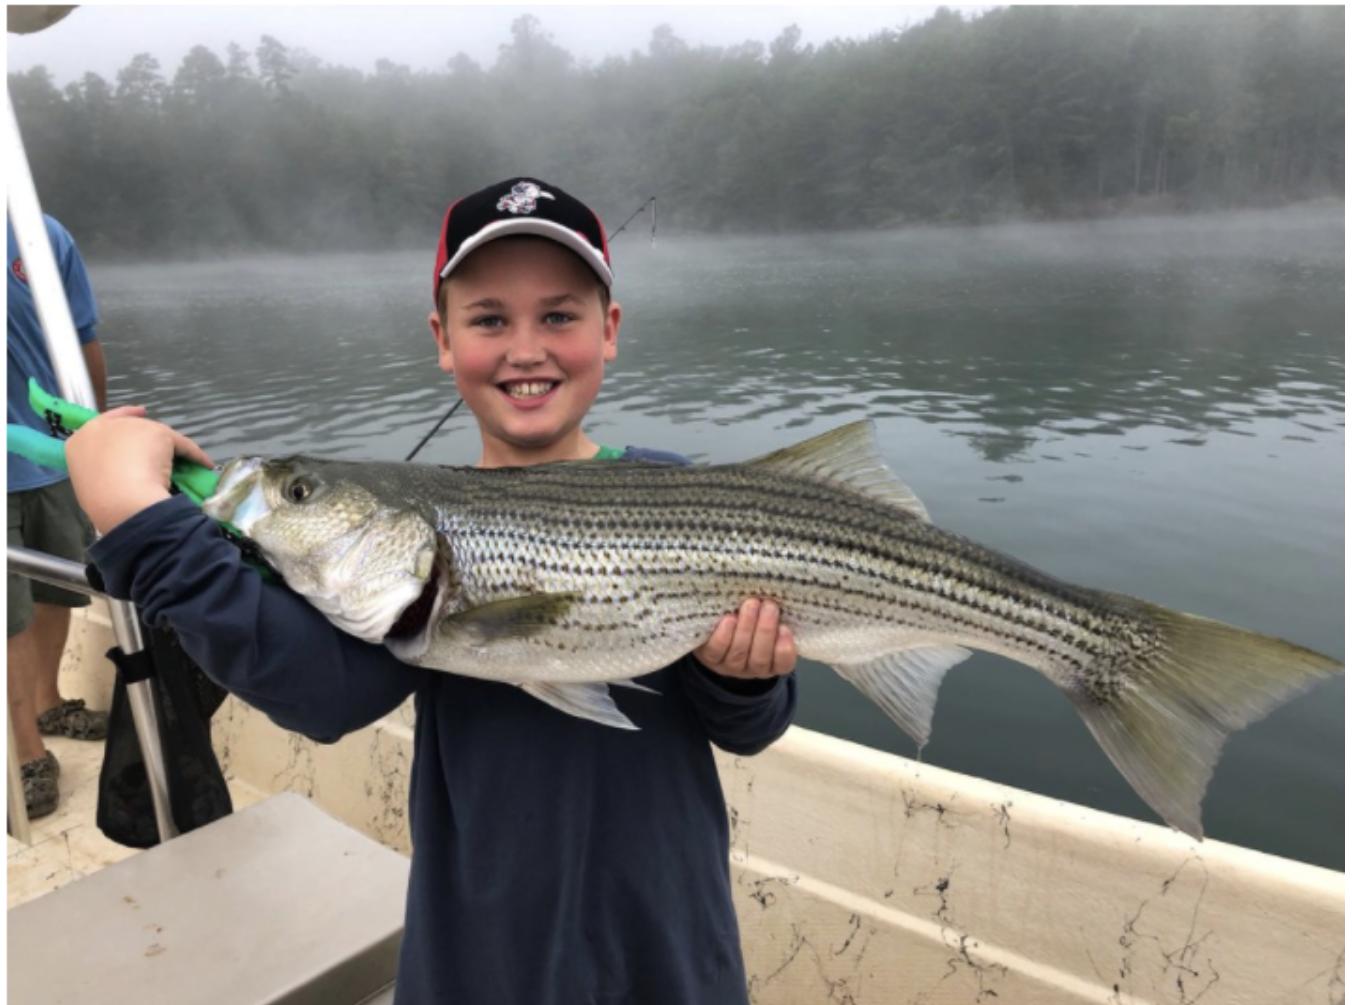 Georgia Fishing Report: August 13, 2021 —